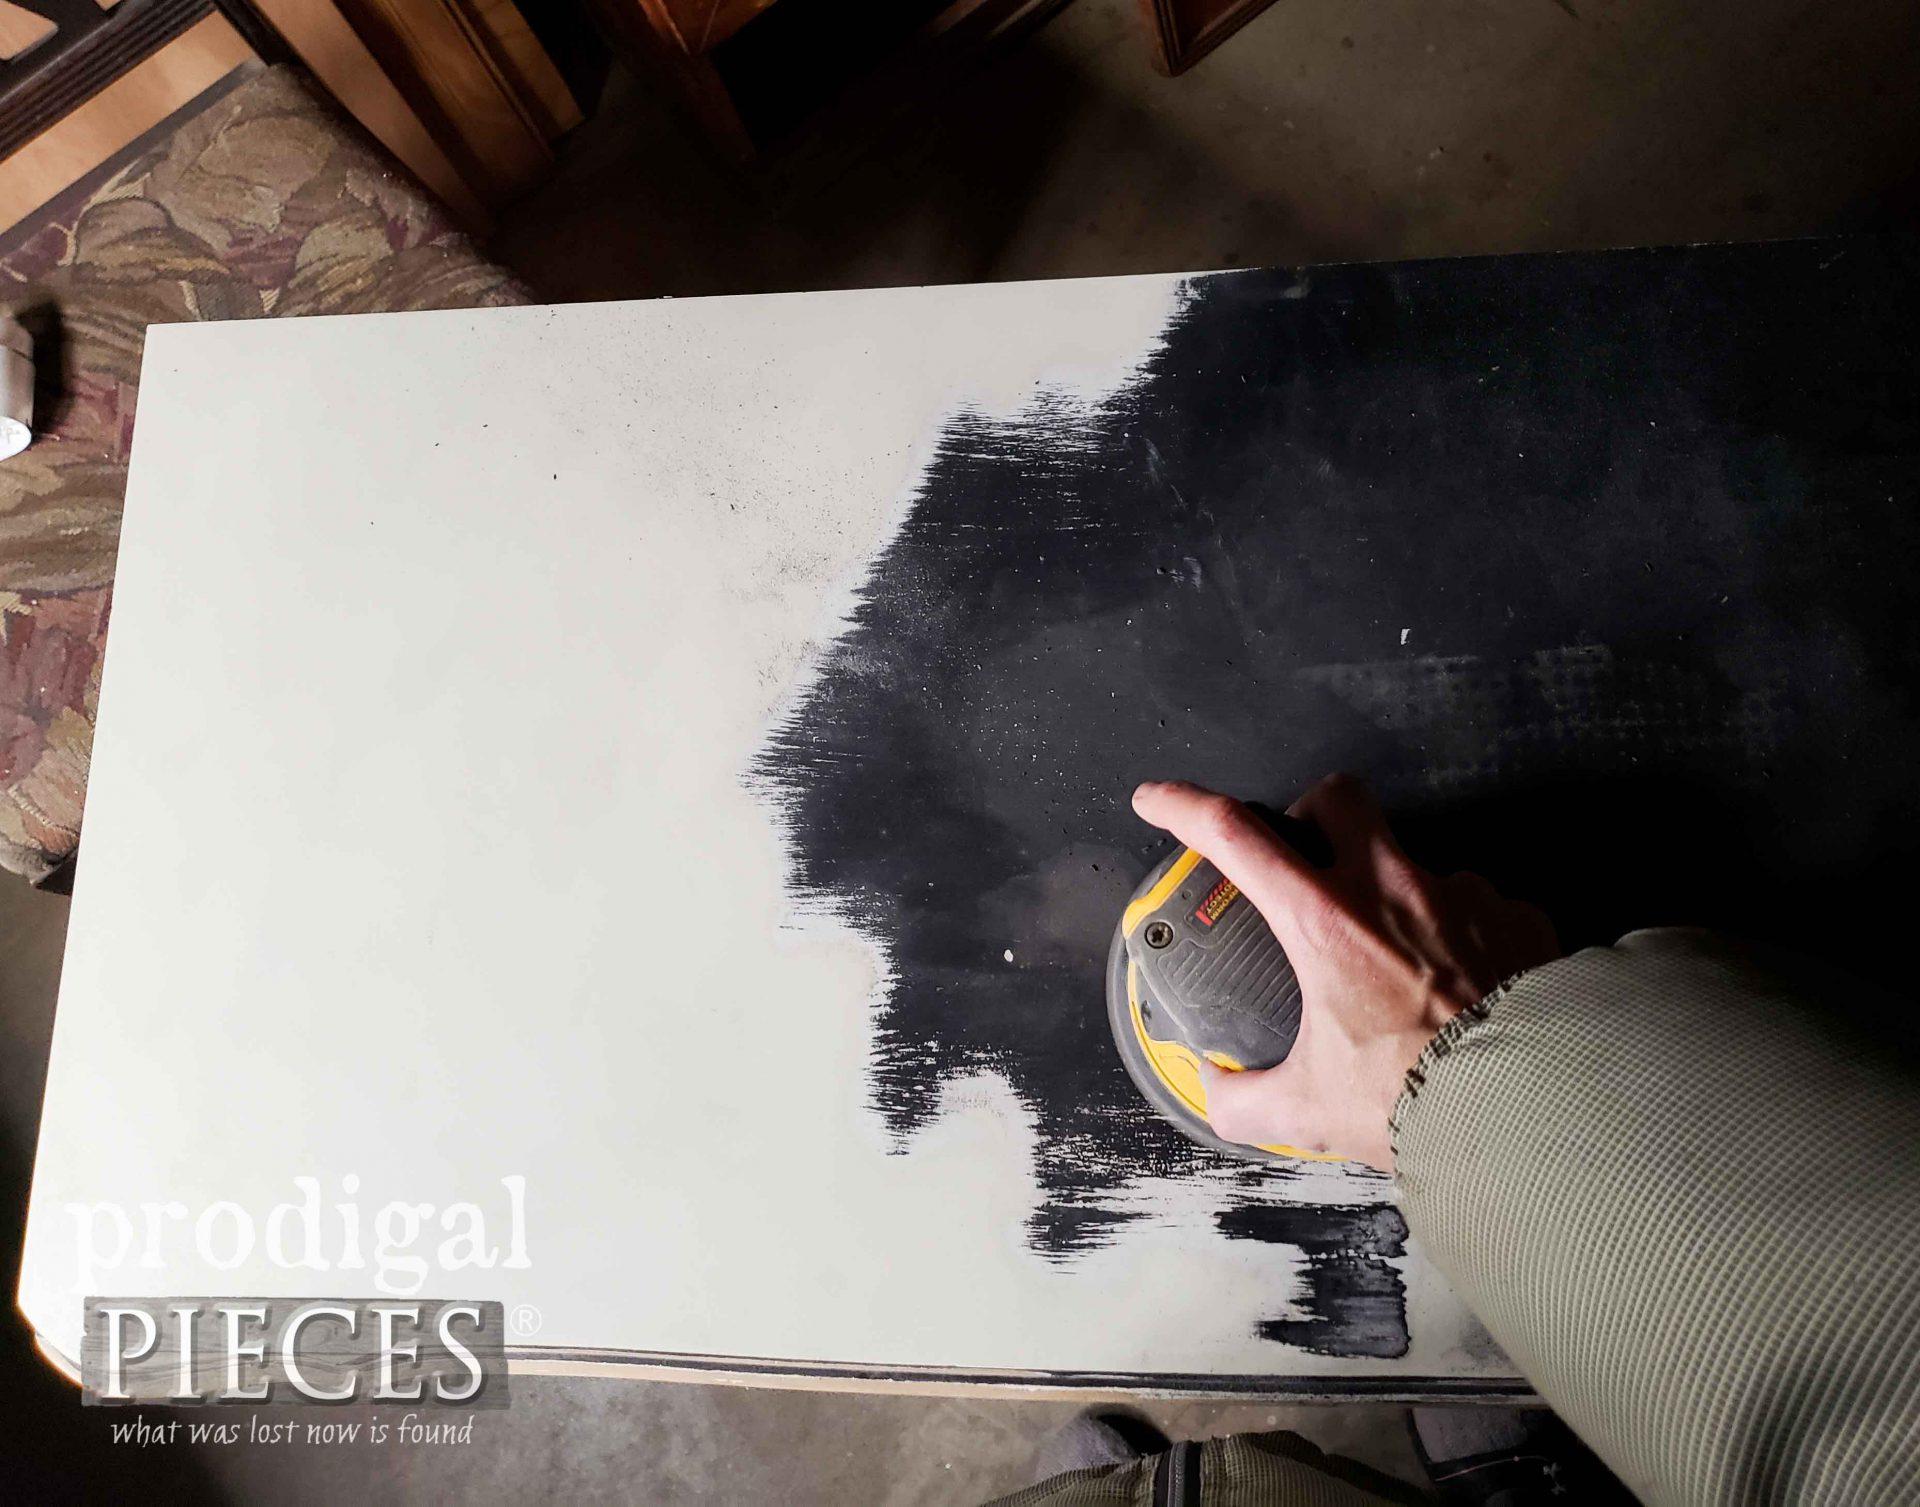 Sanding French Provincial Desk Top | Laminate Surface | prodigalpieces.com